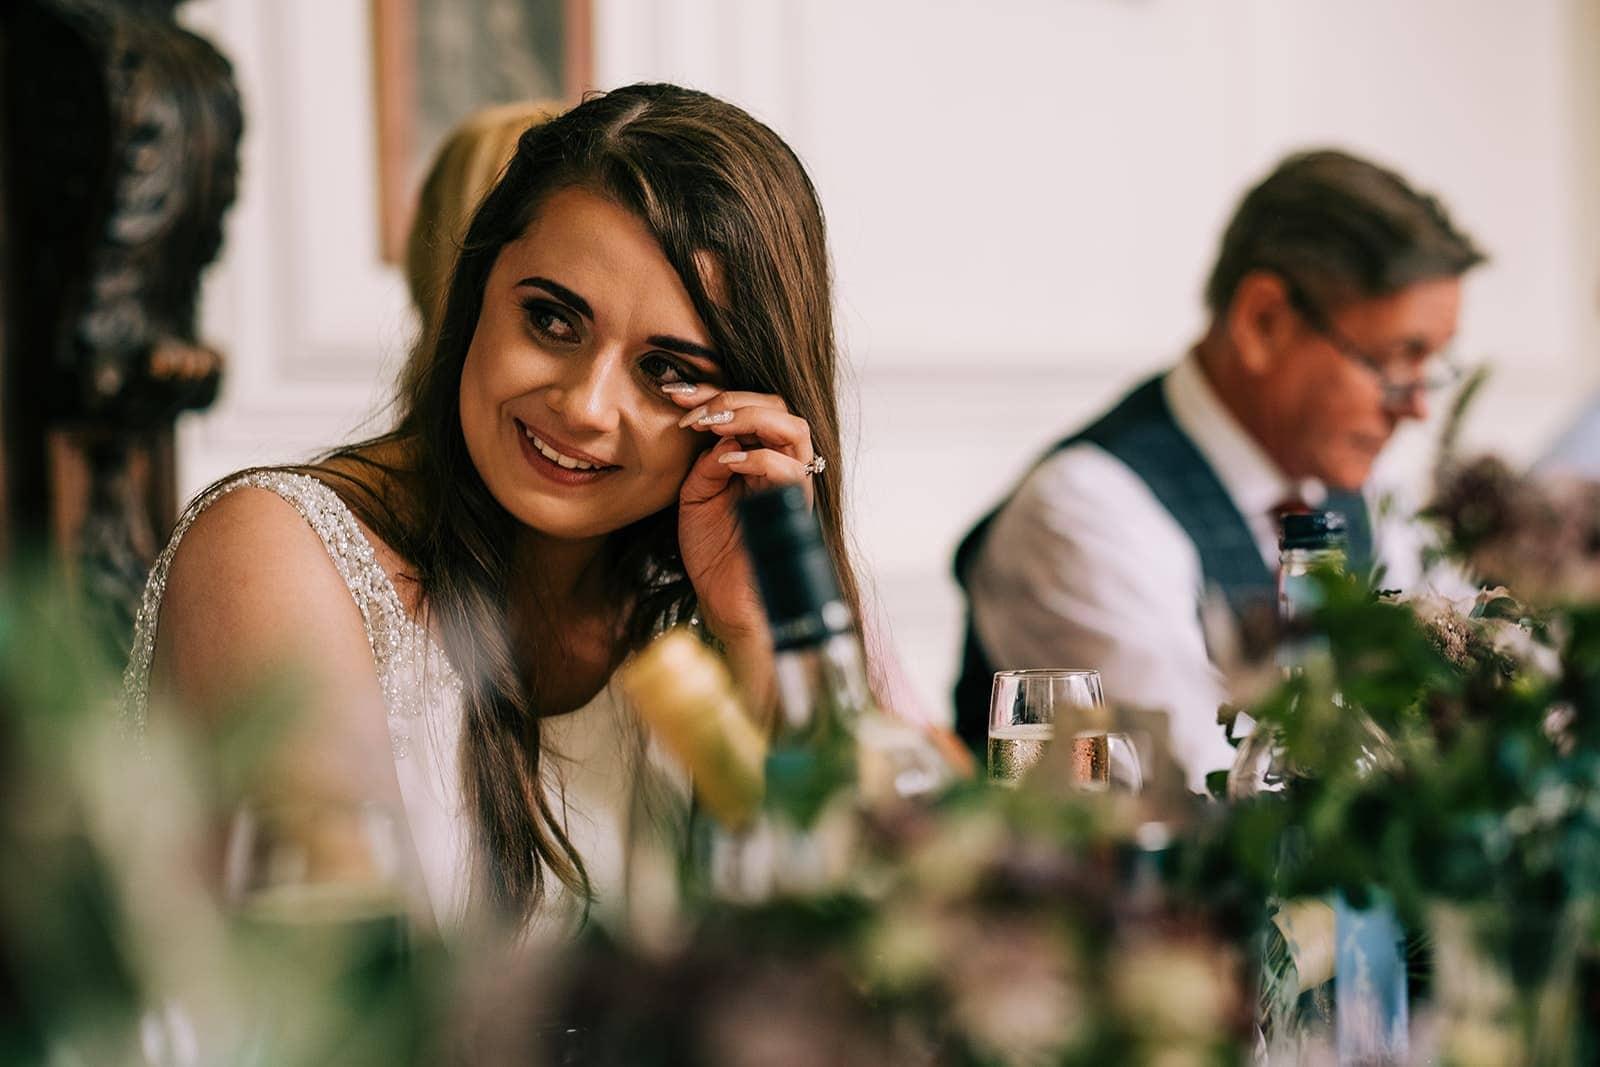 Yasmin get emotional during her bridesmaid speech